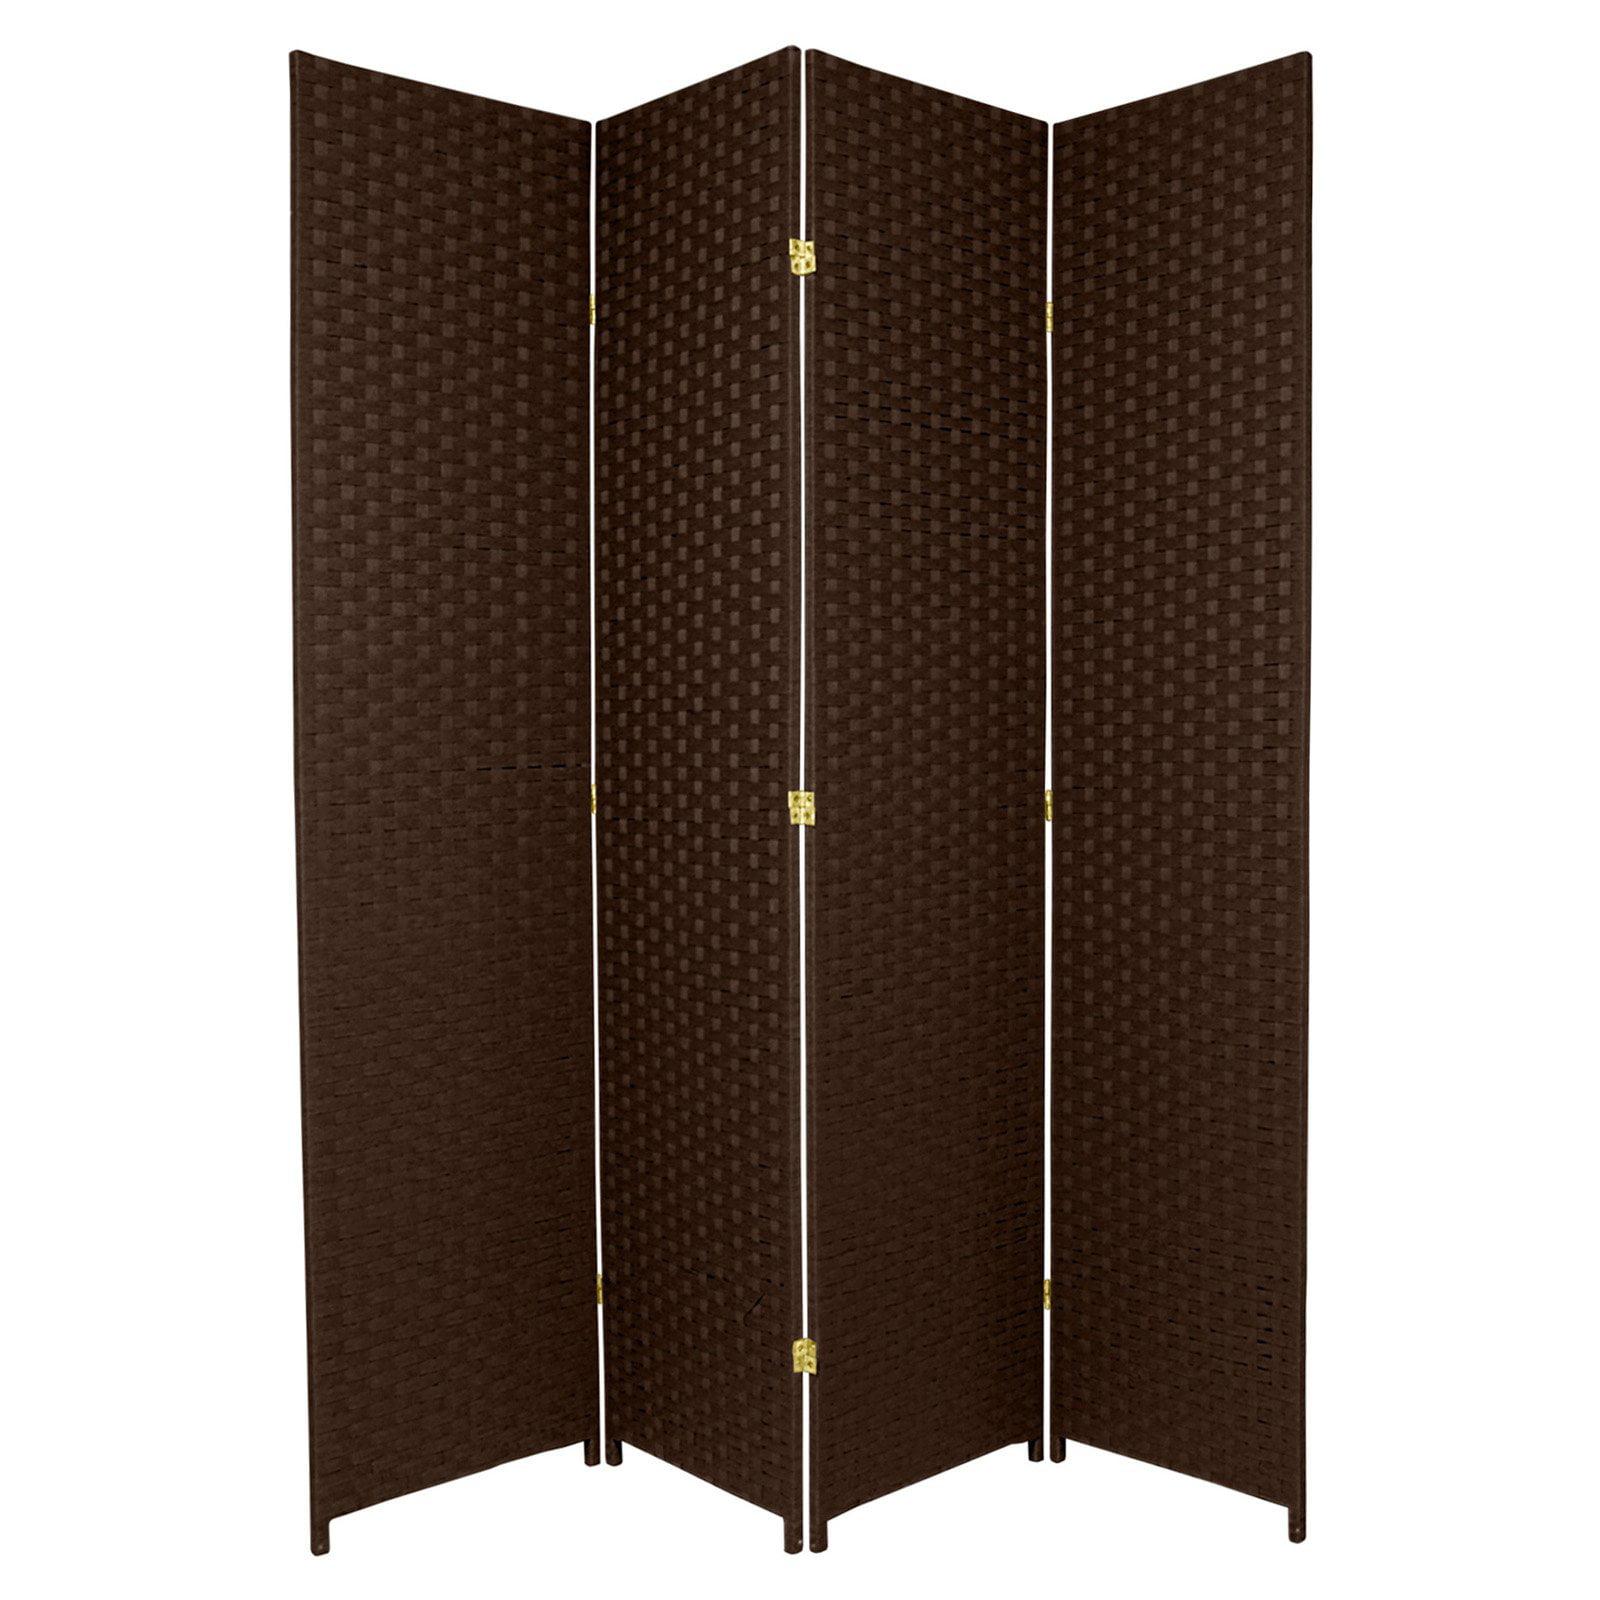 Oriental Furniture 70.75 x 140 8 Panel Room Divider